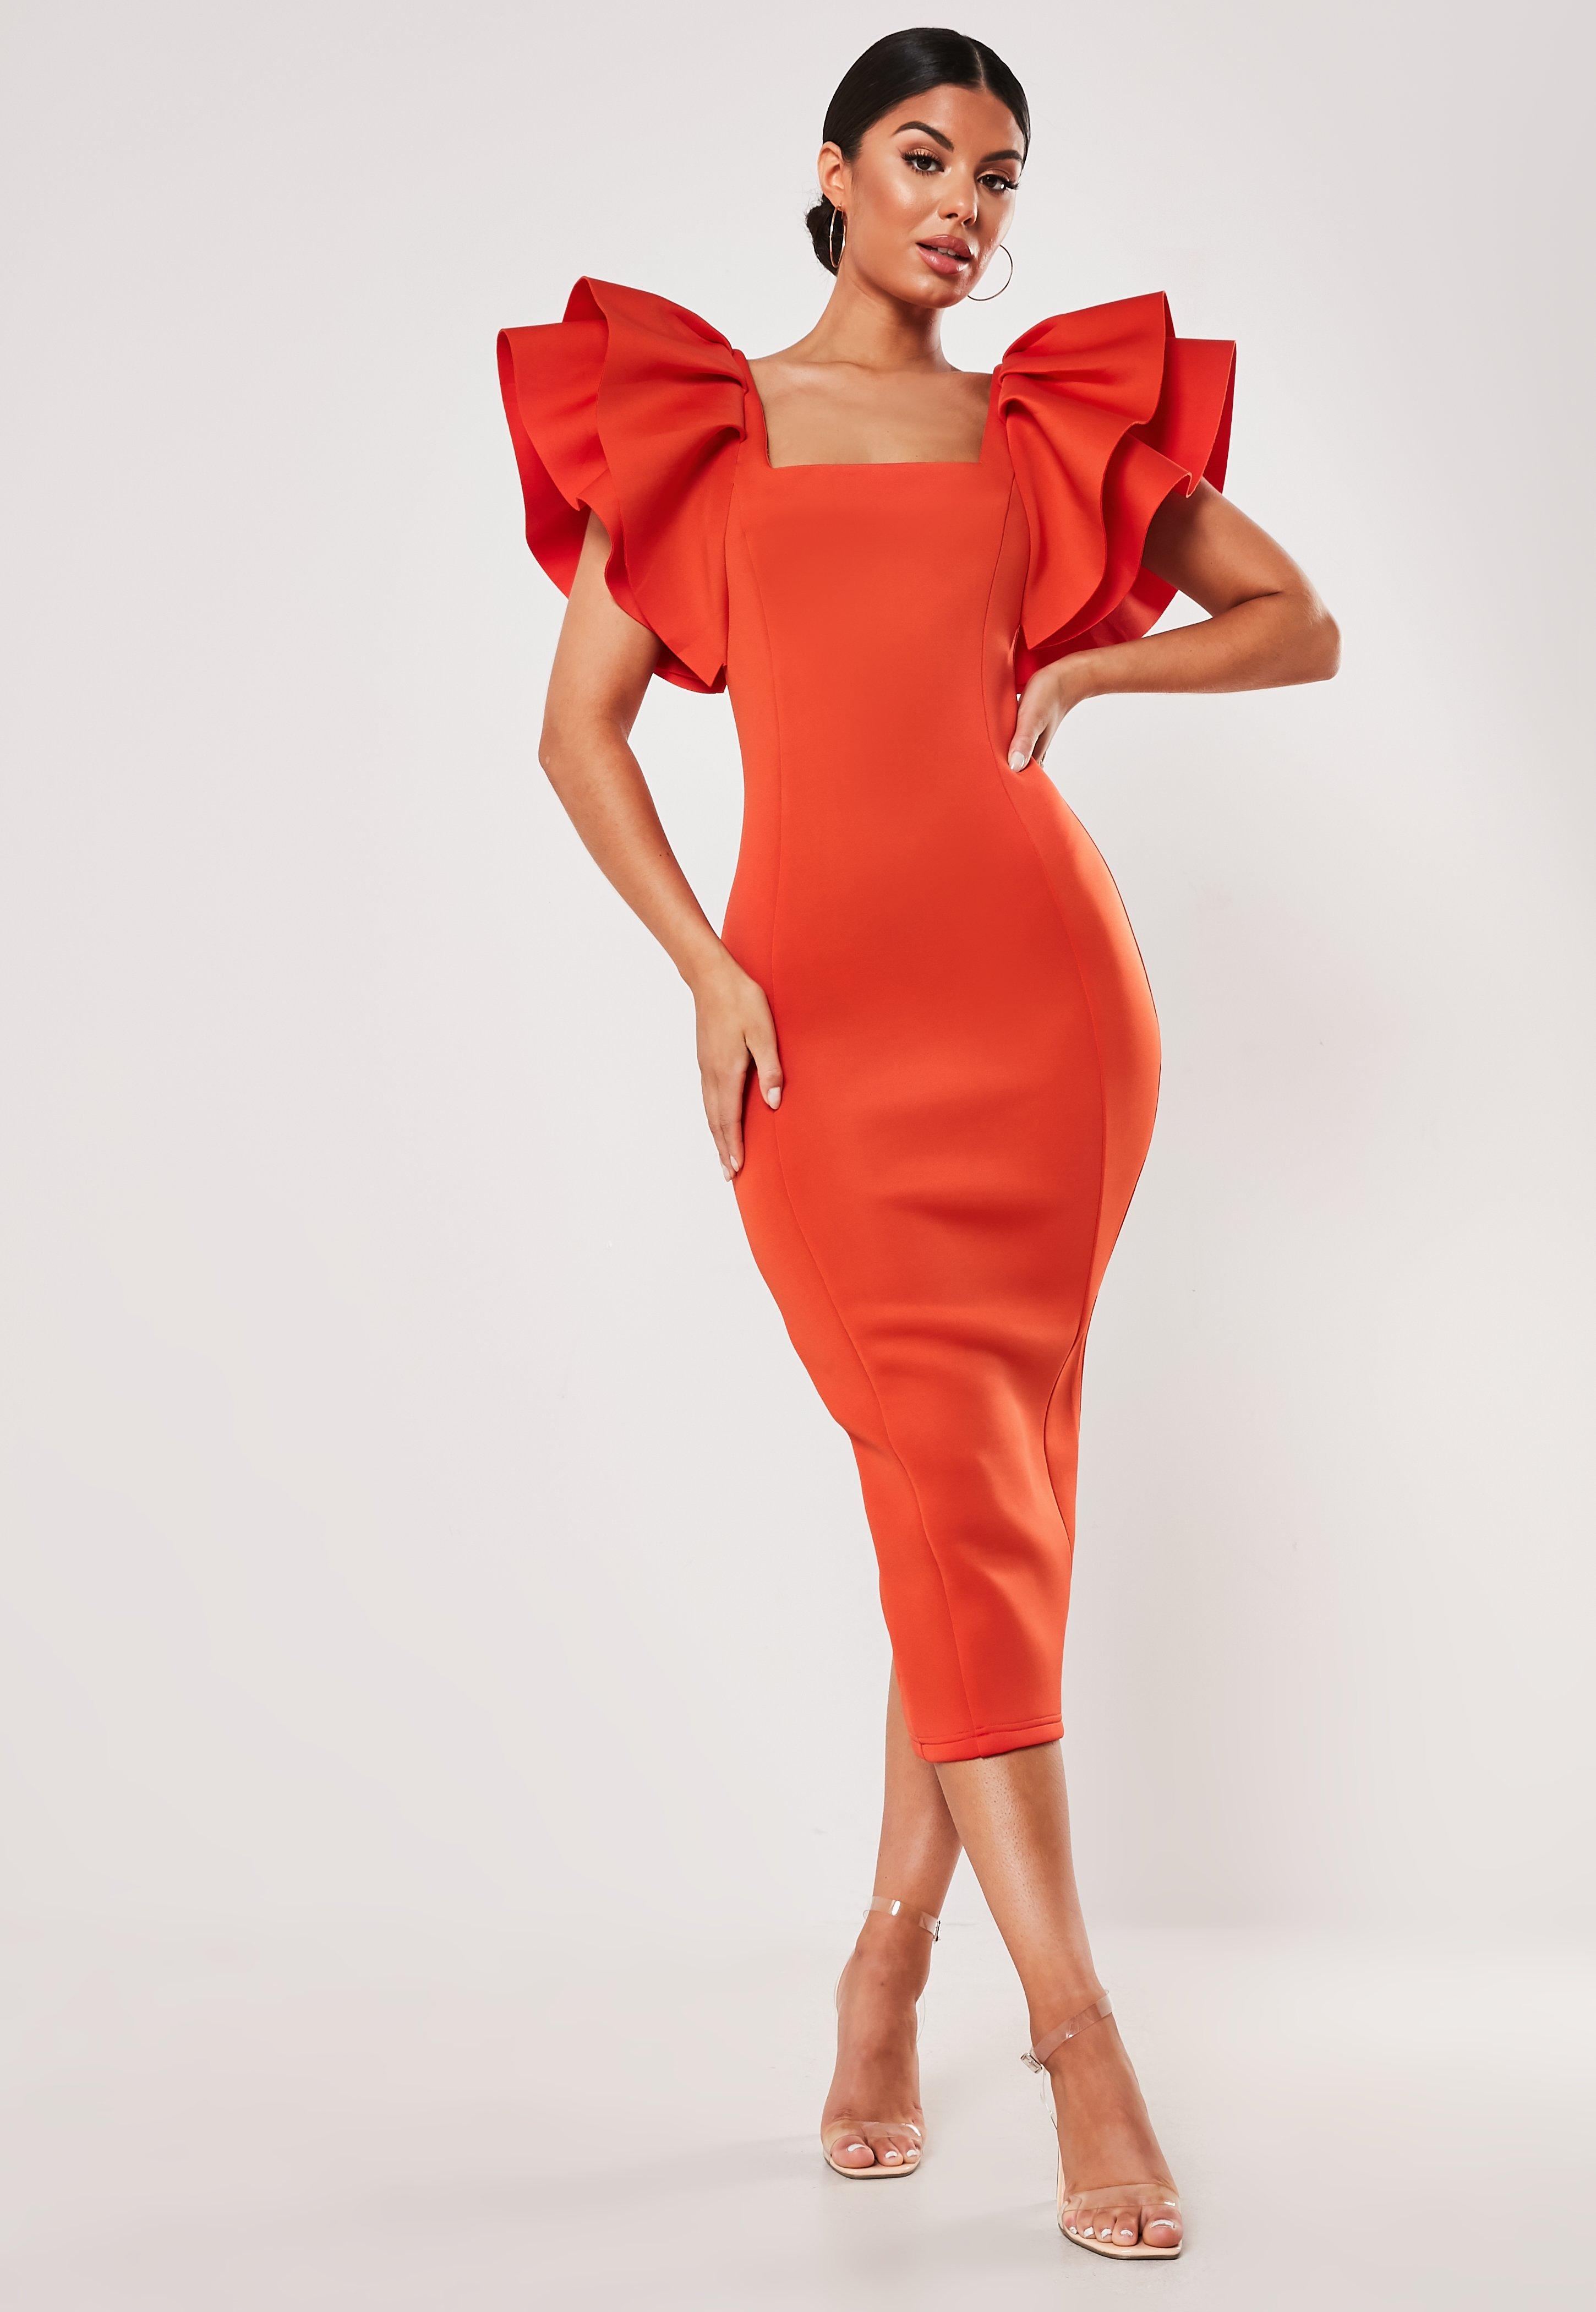 bc6cb41d63d1 Birthday Dresses | Sweet 16, 18th & 21st Dresses - Missguided